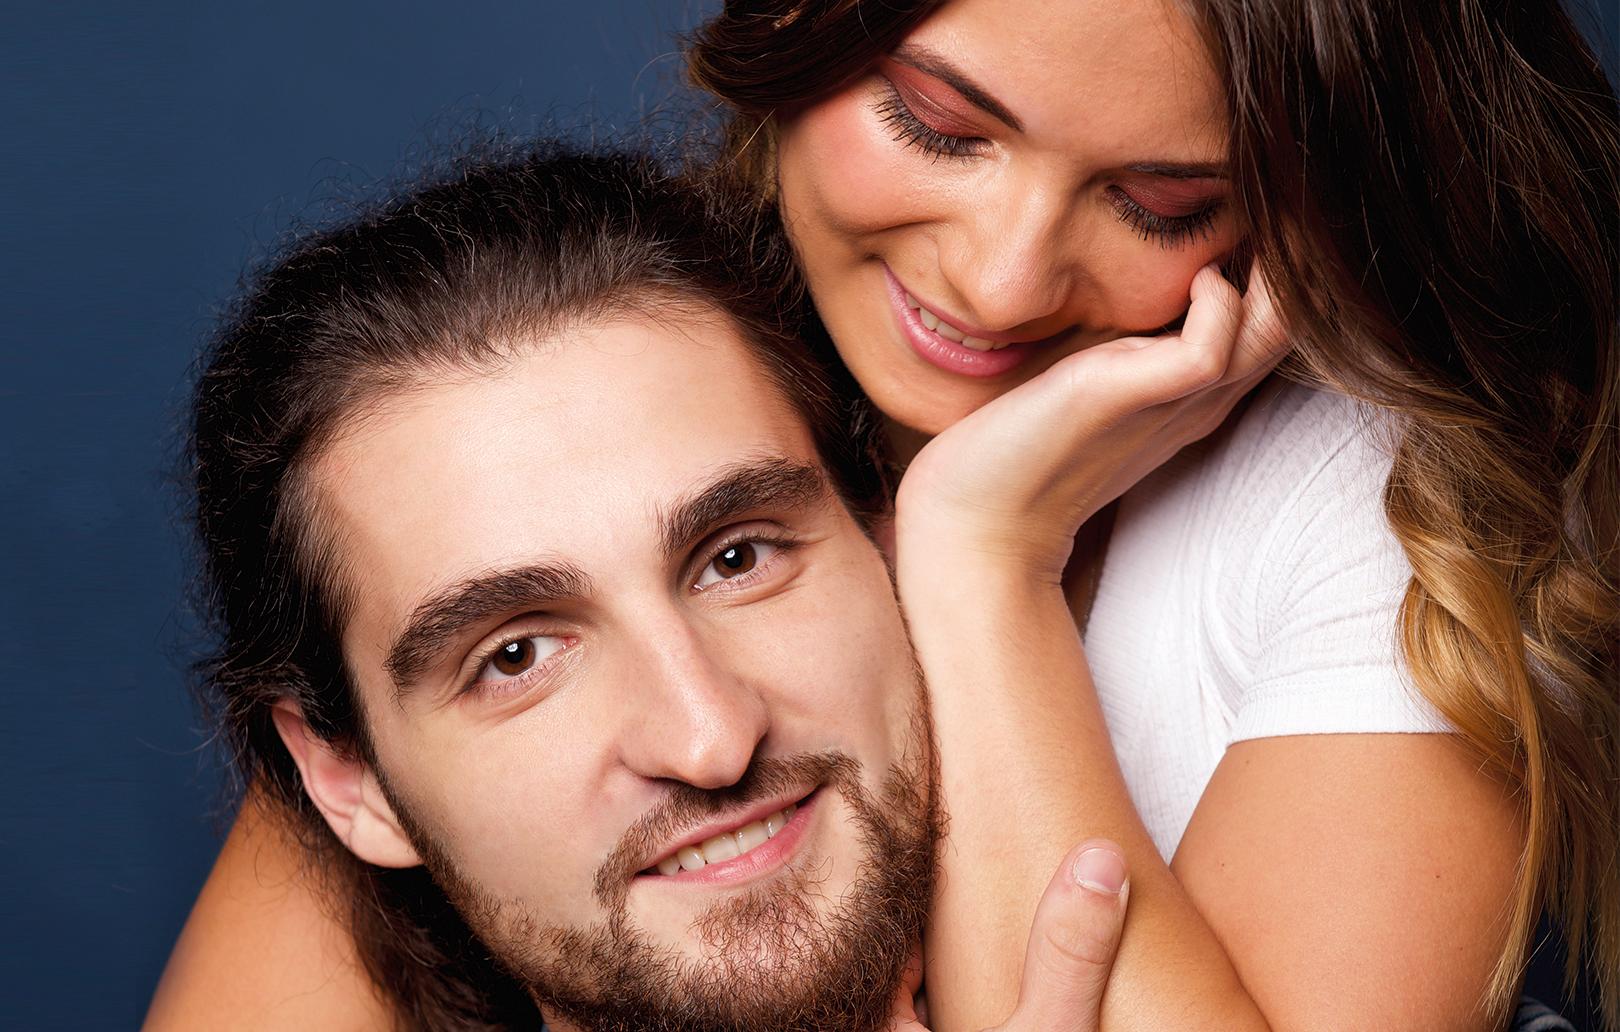 partner-fotoshooting-bremen-bg41617886000